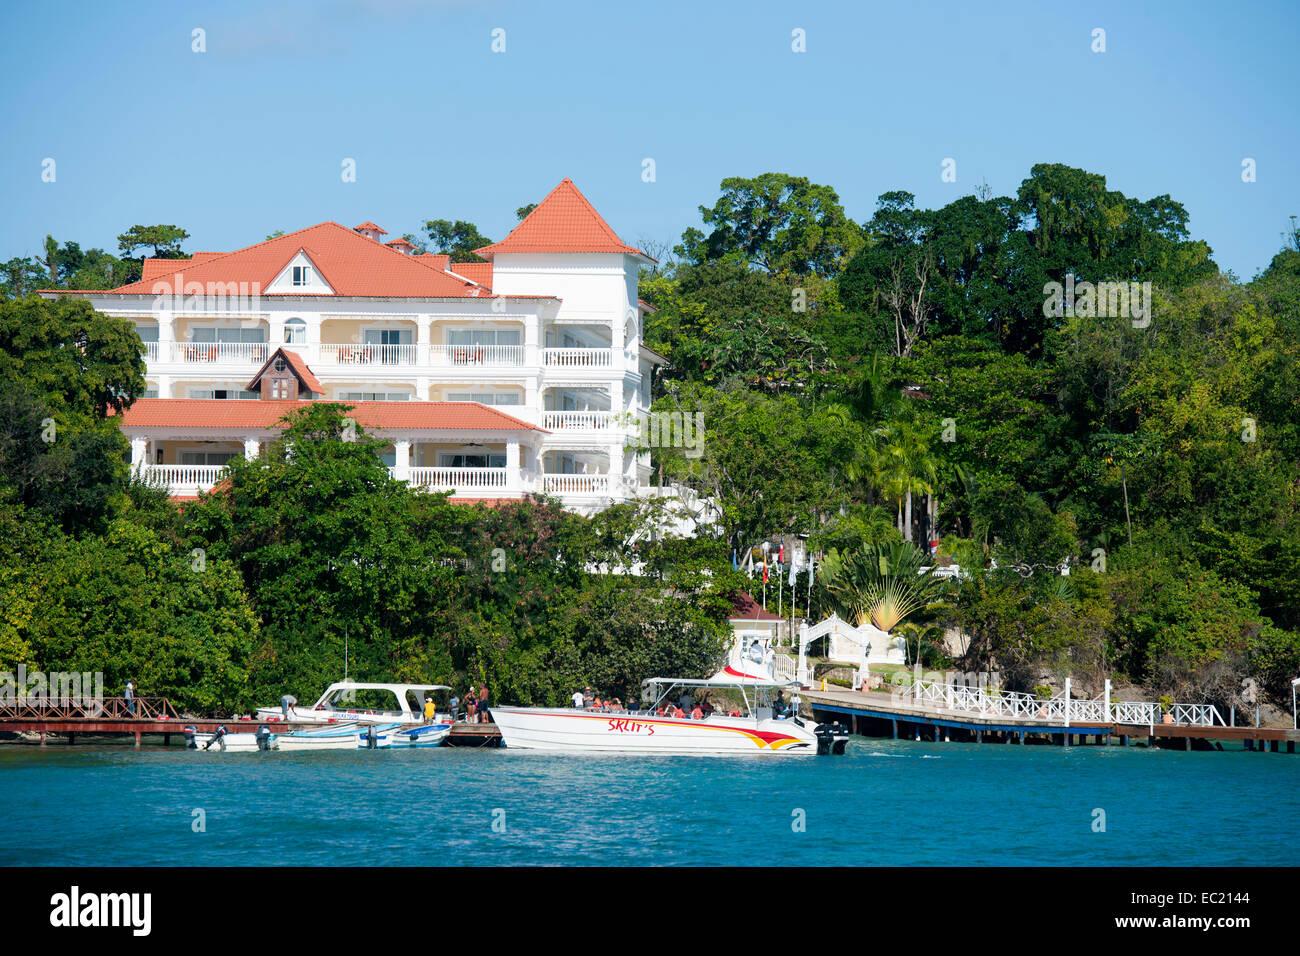 Dominikanische Republik, Halbinsel Samana, Santa Barbara de Samana, Insel Cayo Levantado (Bacardiinsel), Hotel Luxery - Stock Image